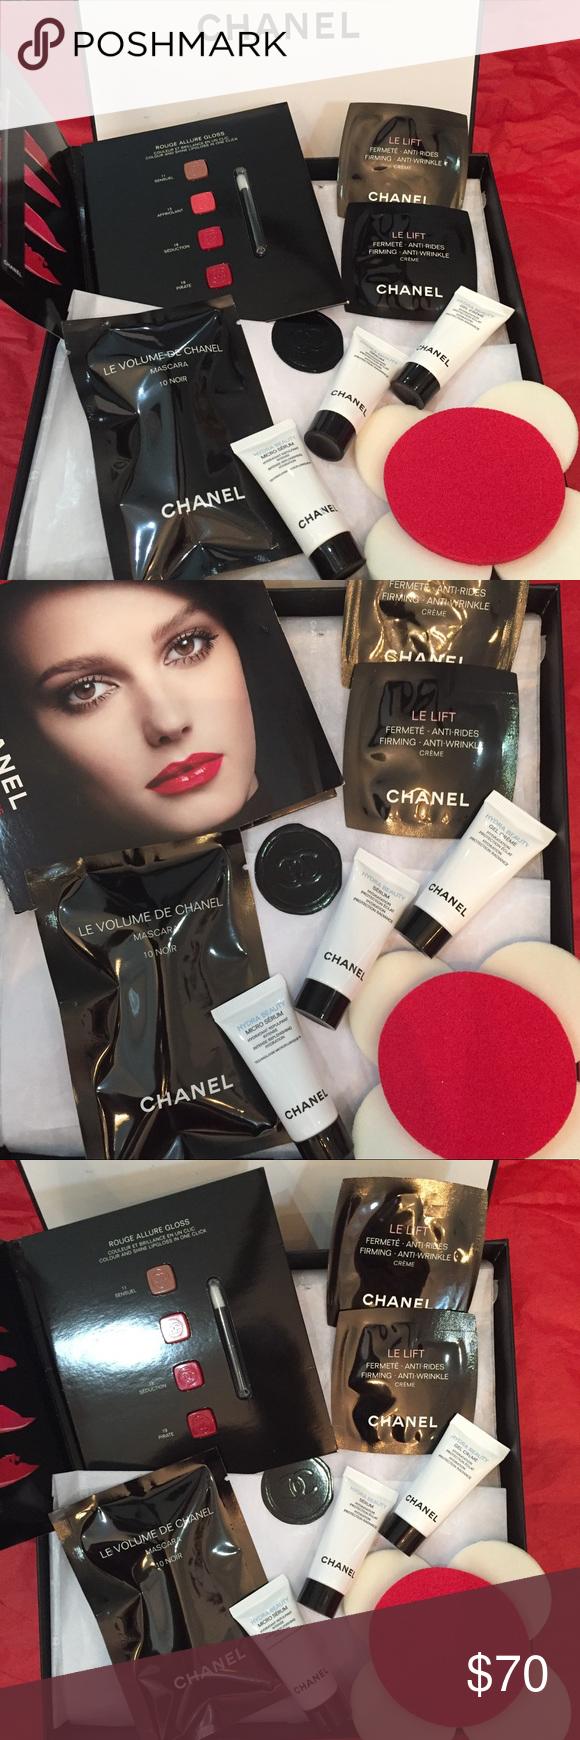 Chanel 🎁 Last One 🎁 Boutique Chanel mascara, Chanel